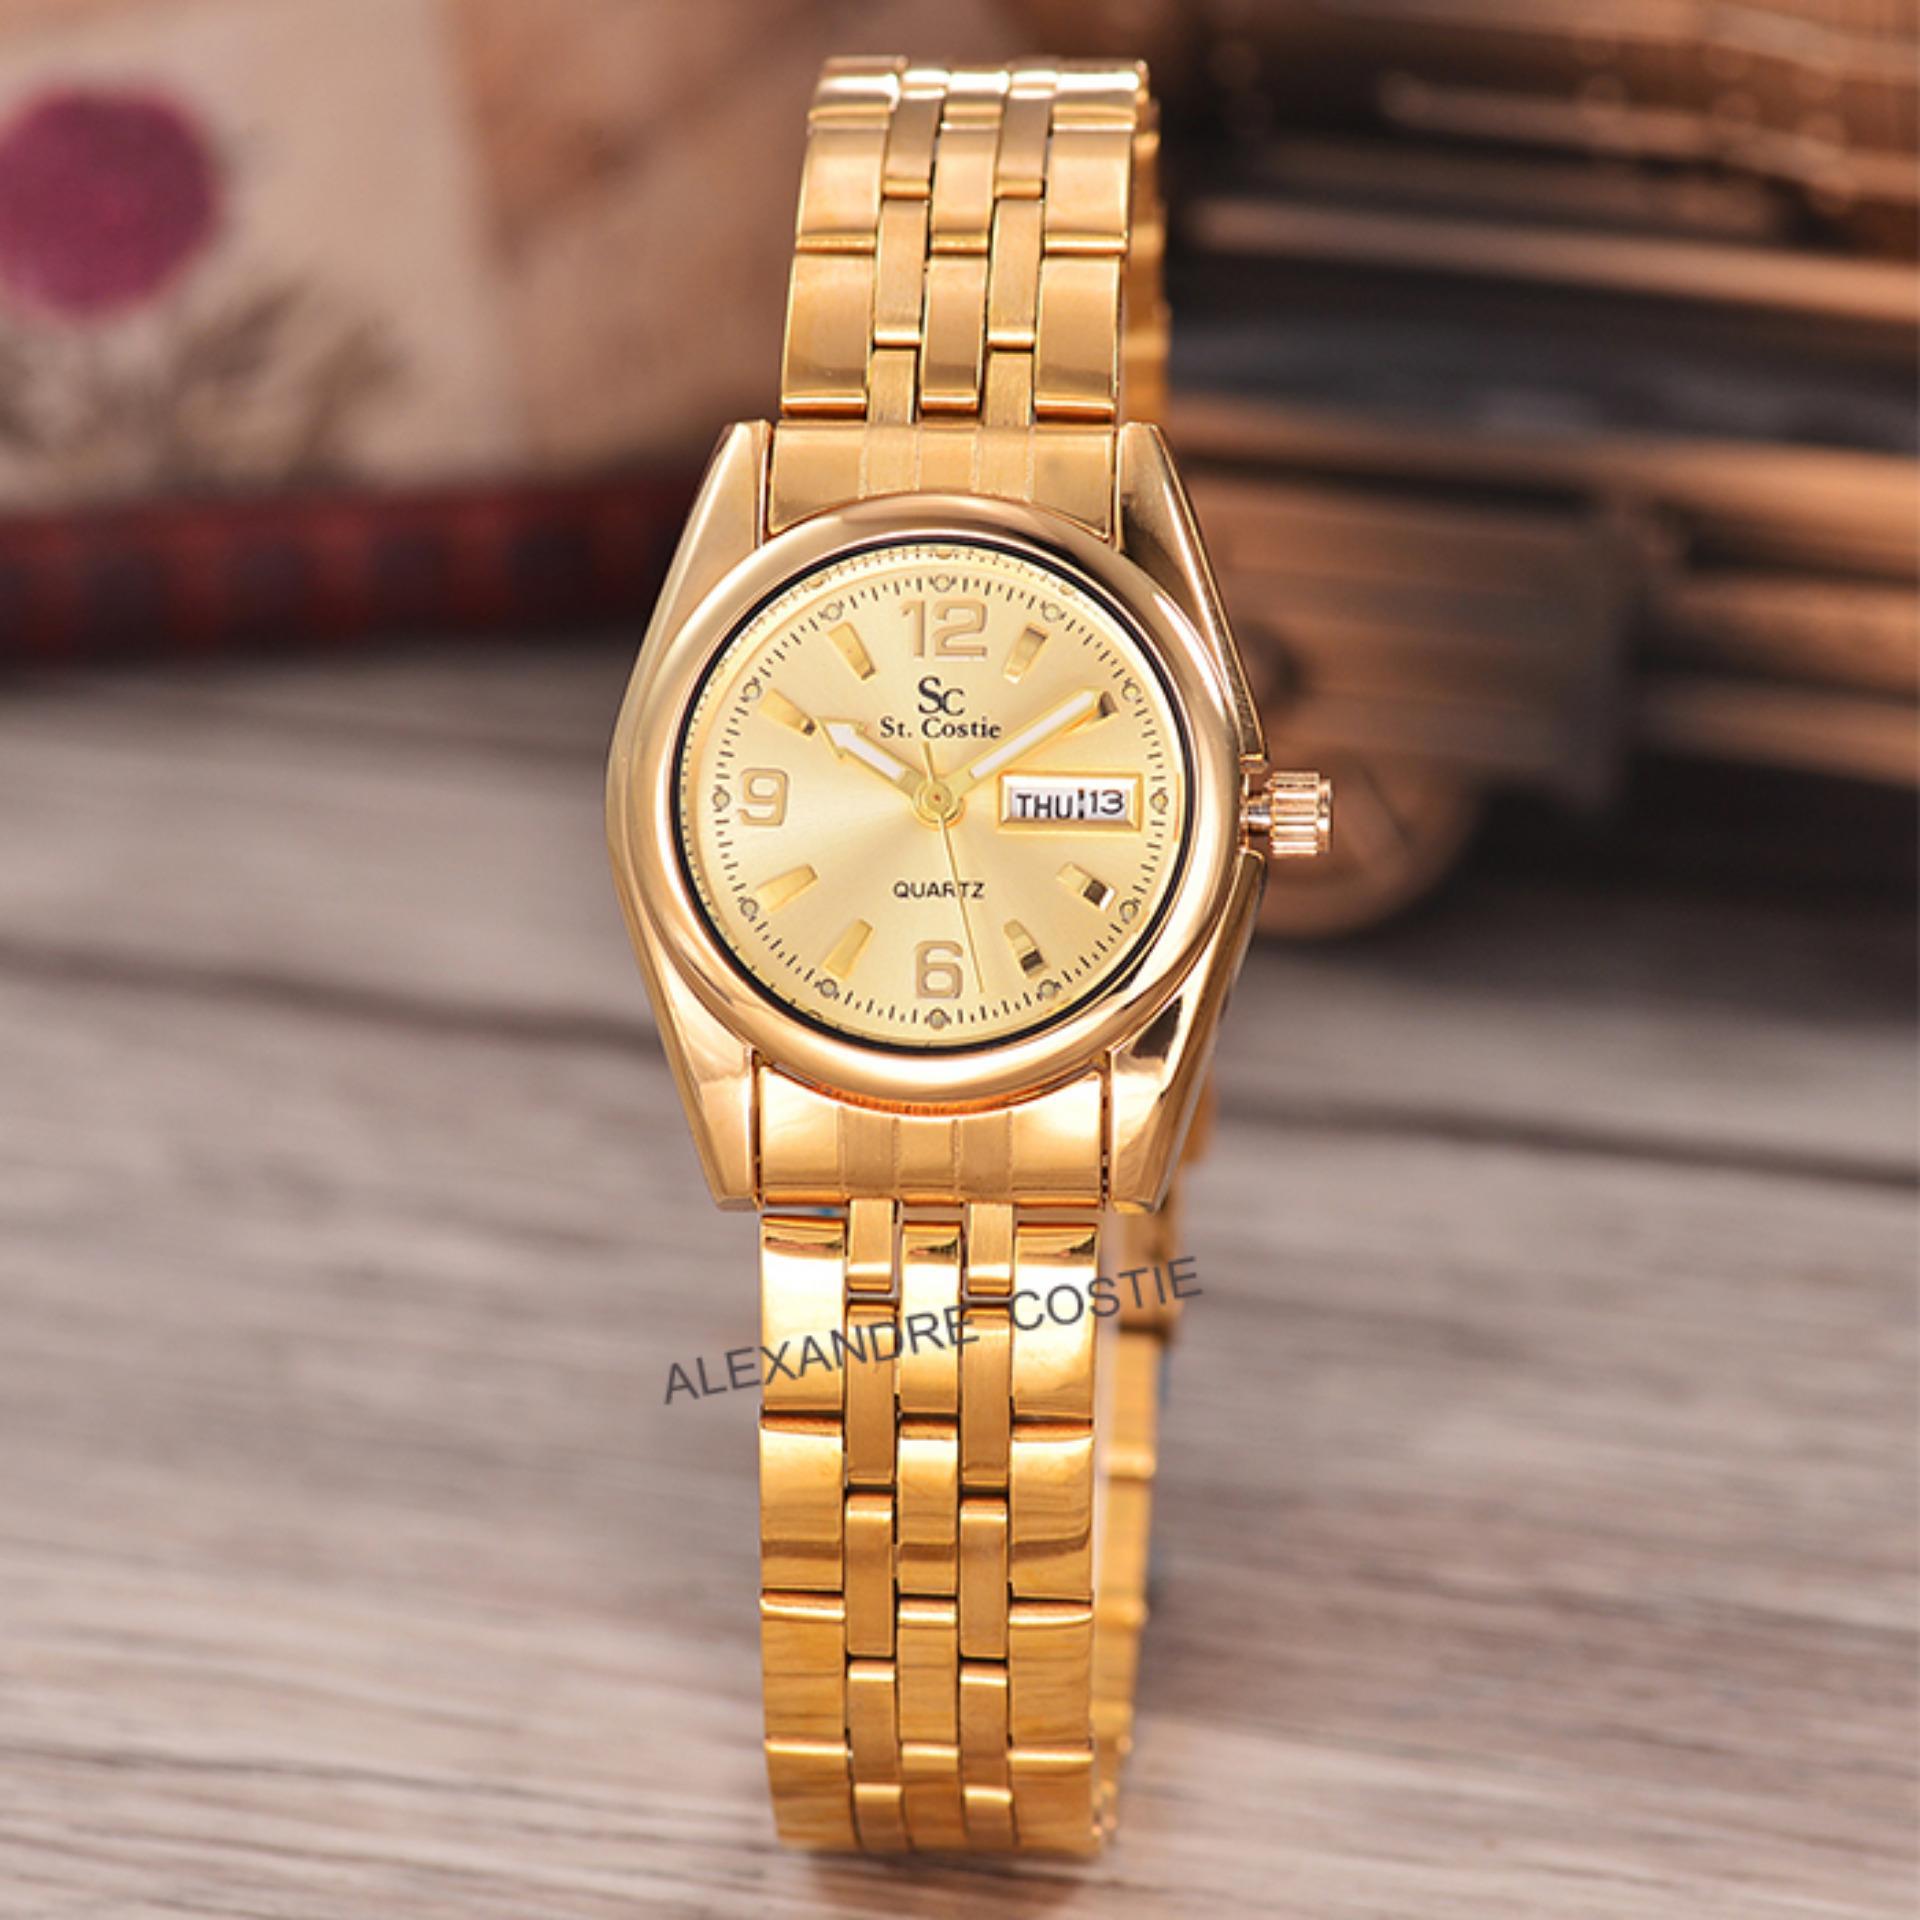 ... Saint Costie Original Brand-Jam Tangan Wanita-Body gold-gold dial- Stainless ...